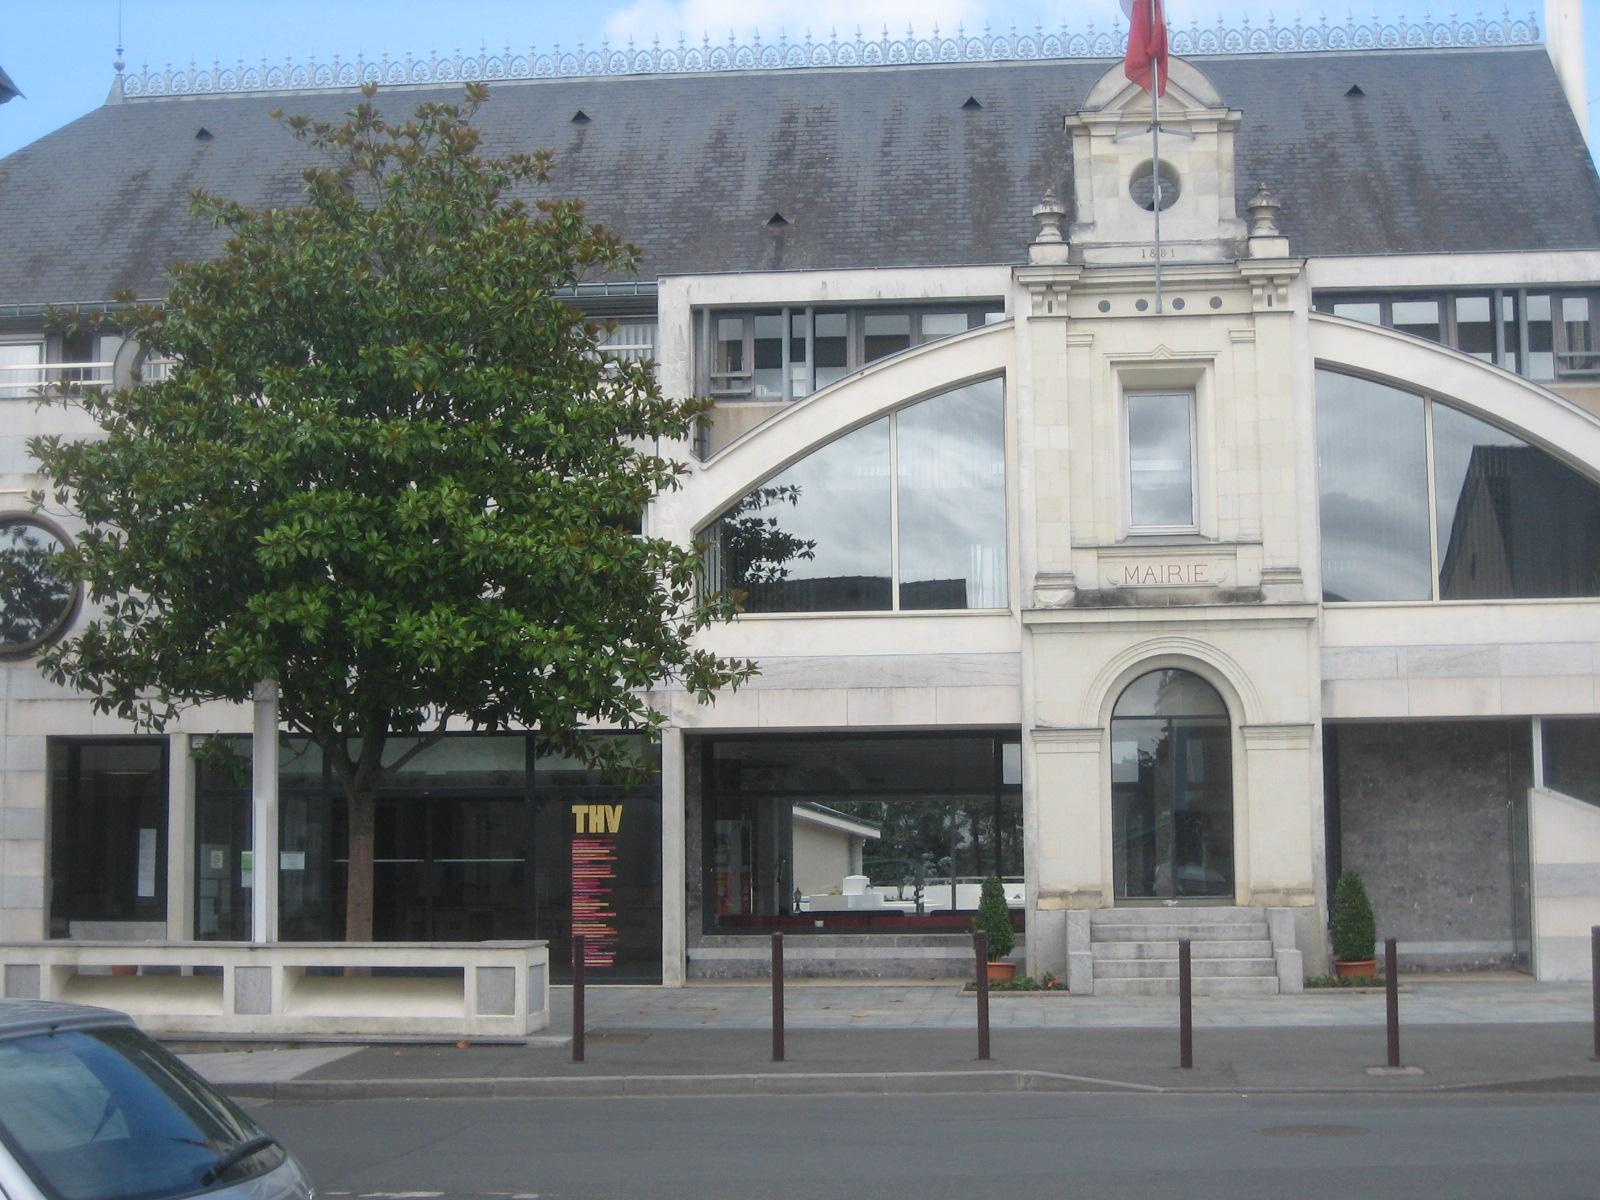 Saint barth lemy d 39 anjou infoplus conseil municipal for Les 5 jardins saint barthelemy d anjou